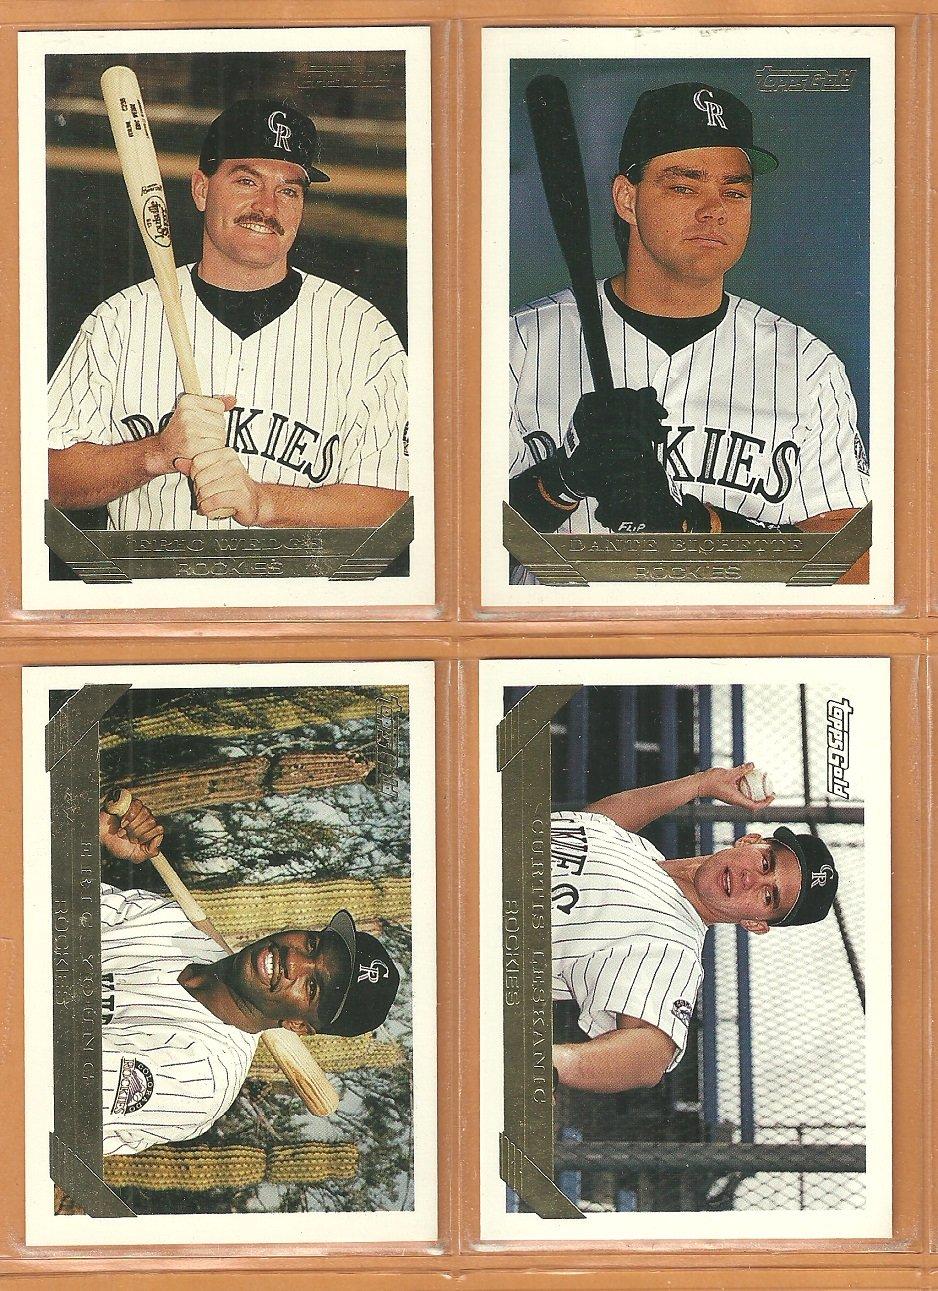 1993 Topps Gold Insert Colorado Rockies Team Lot Dante Bichette Jerald Clark Eric Wedge Rudy Seanez